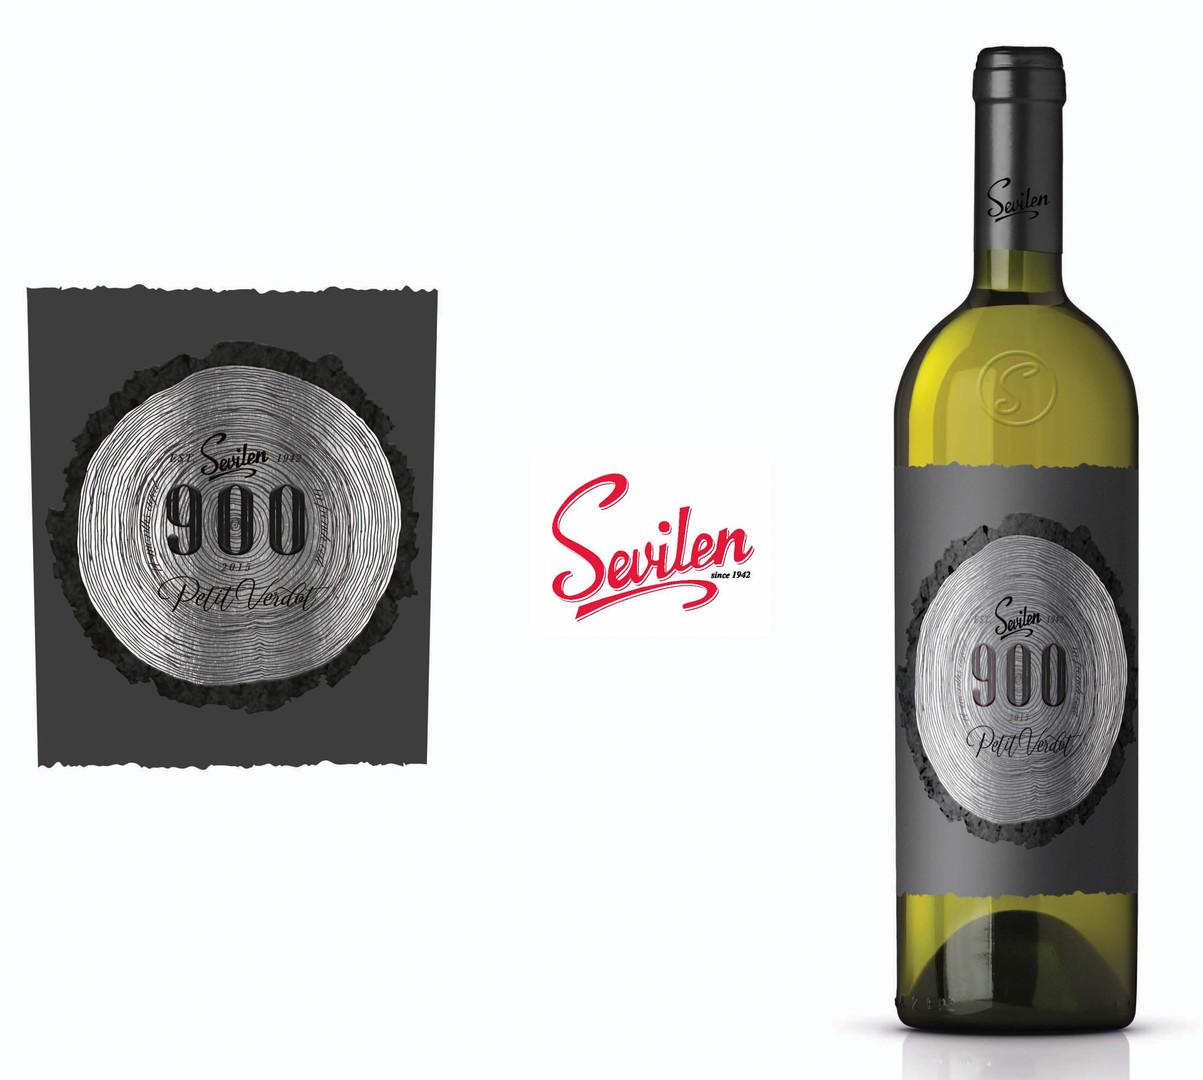 900 Petit Verdot-Sevilen logo